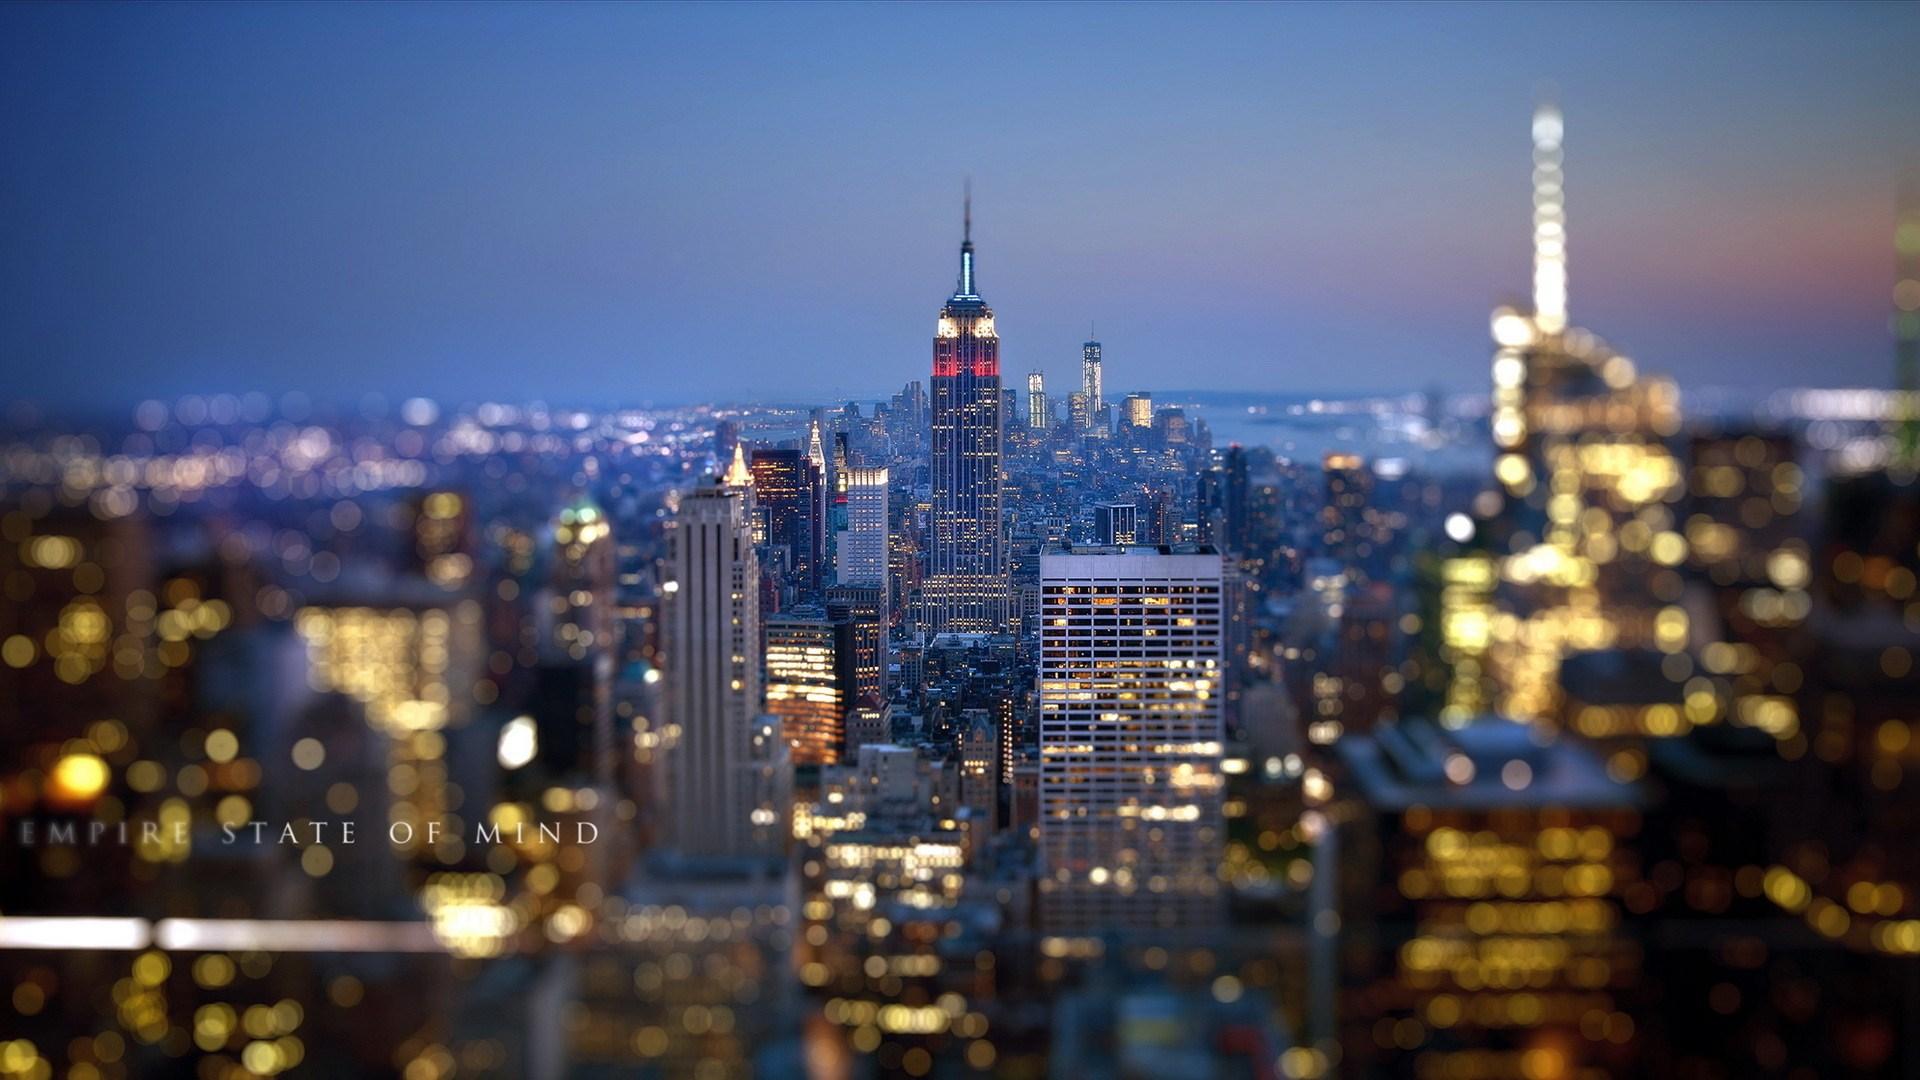 Empire State New York At Night Wallpaper WallpaperLepi 1920x1080